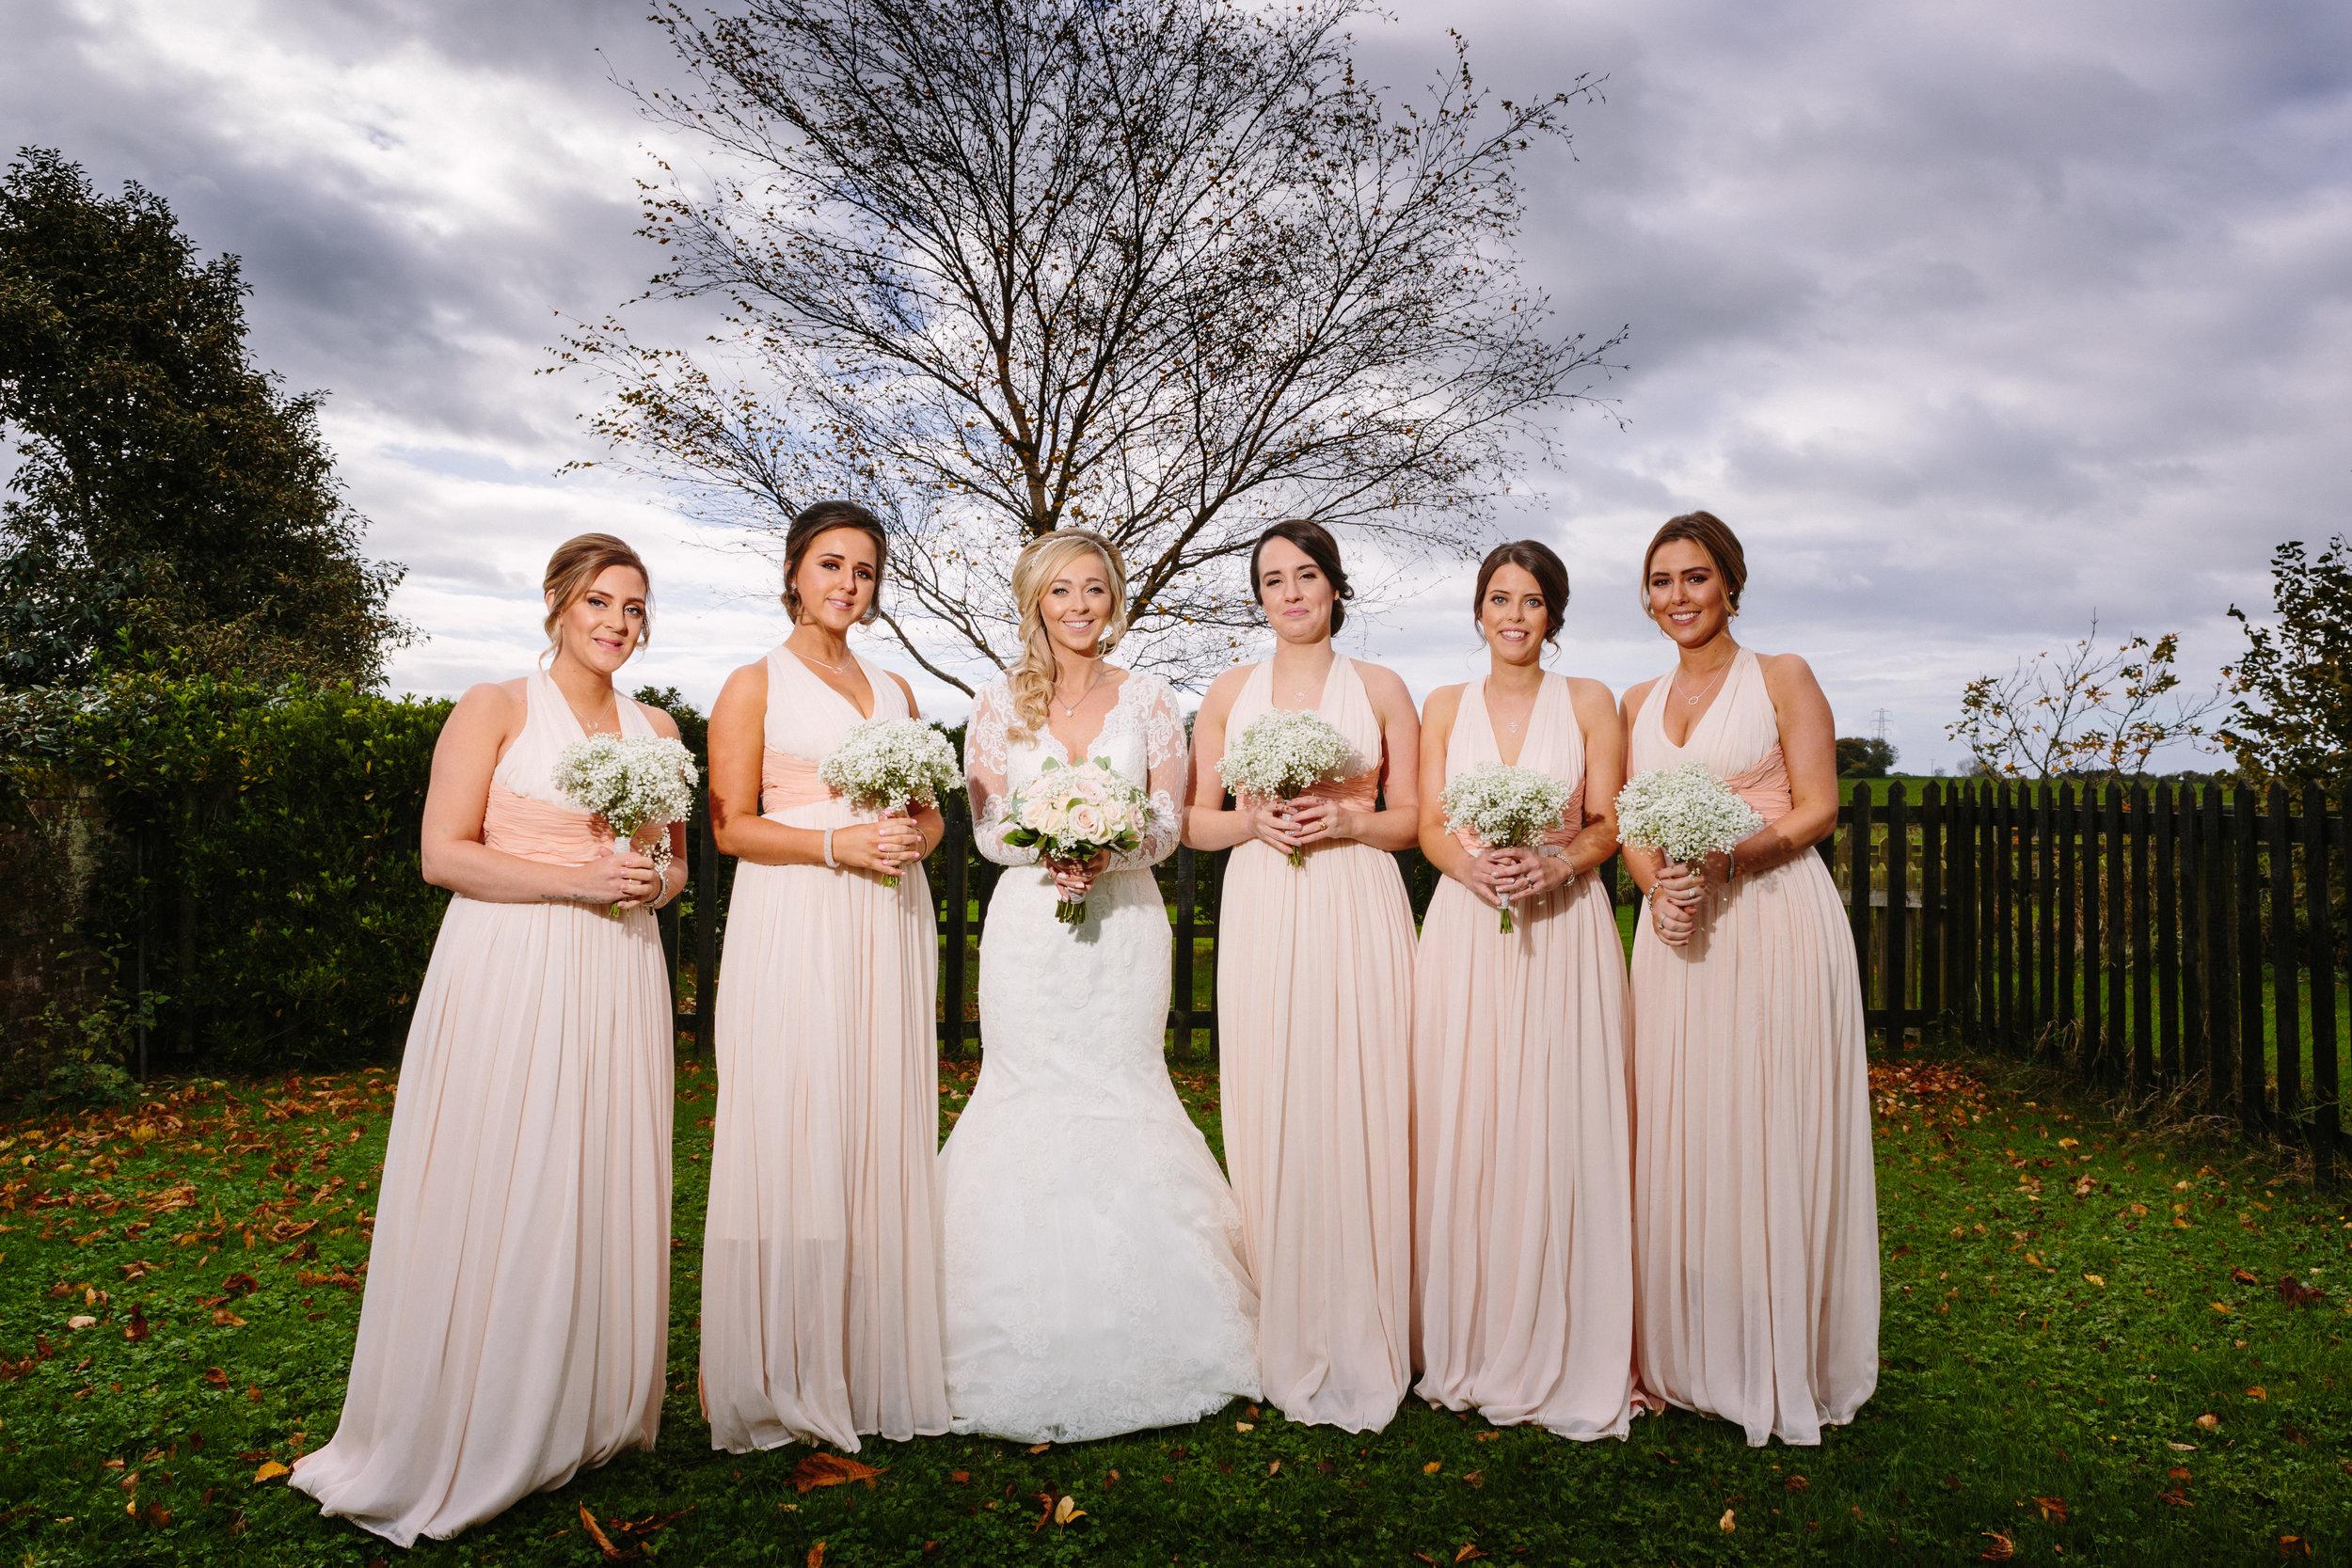 london-hertfordshire-wedding-photography-milling-barn-bridal-prep-28